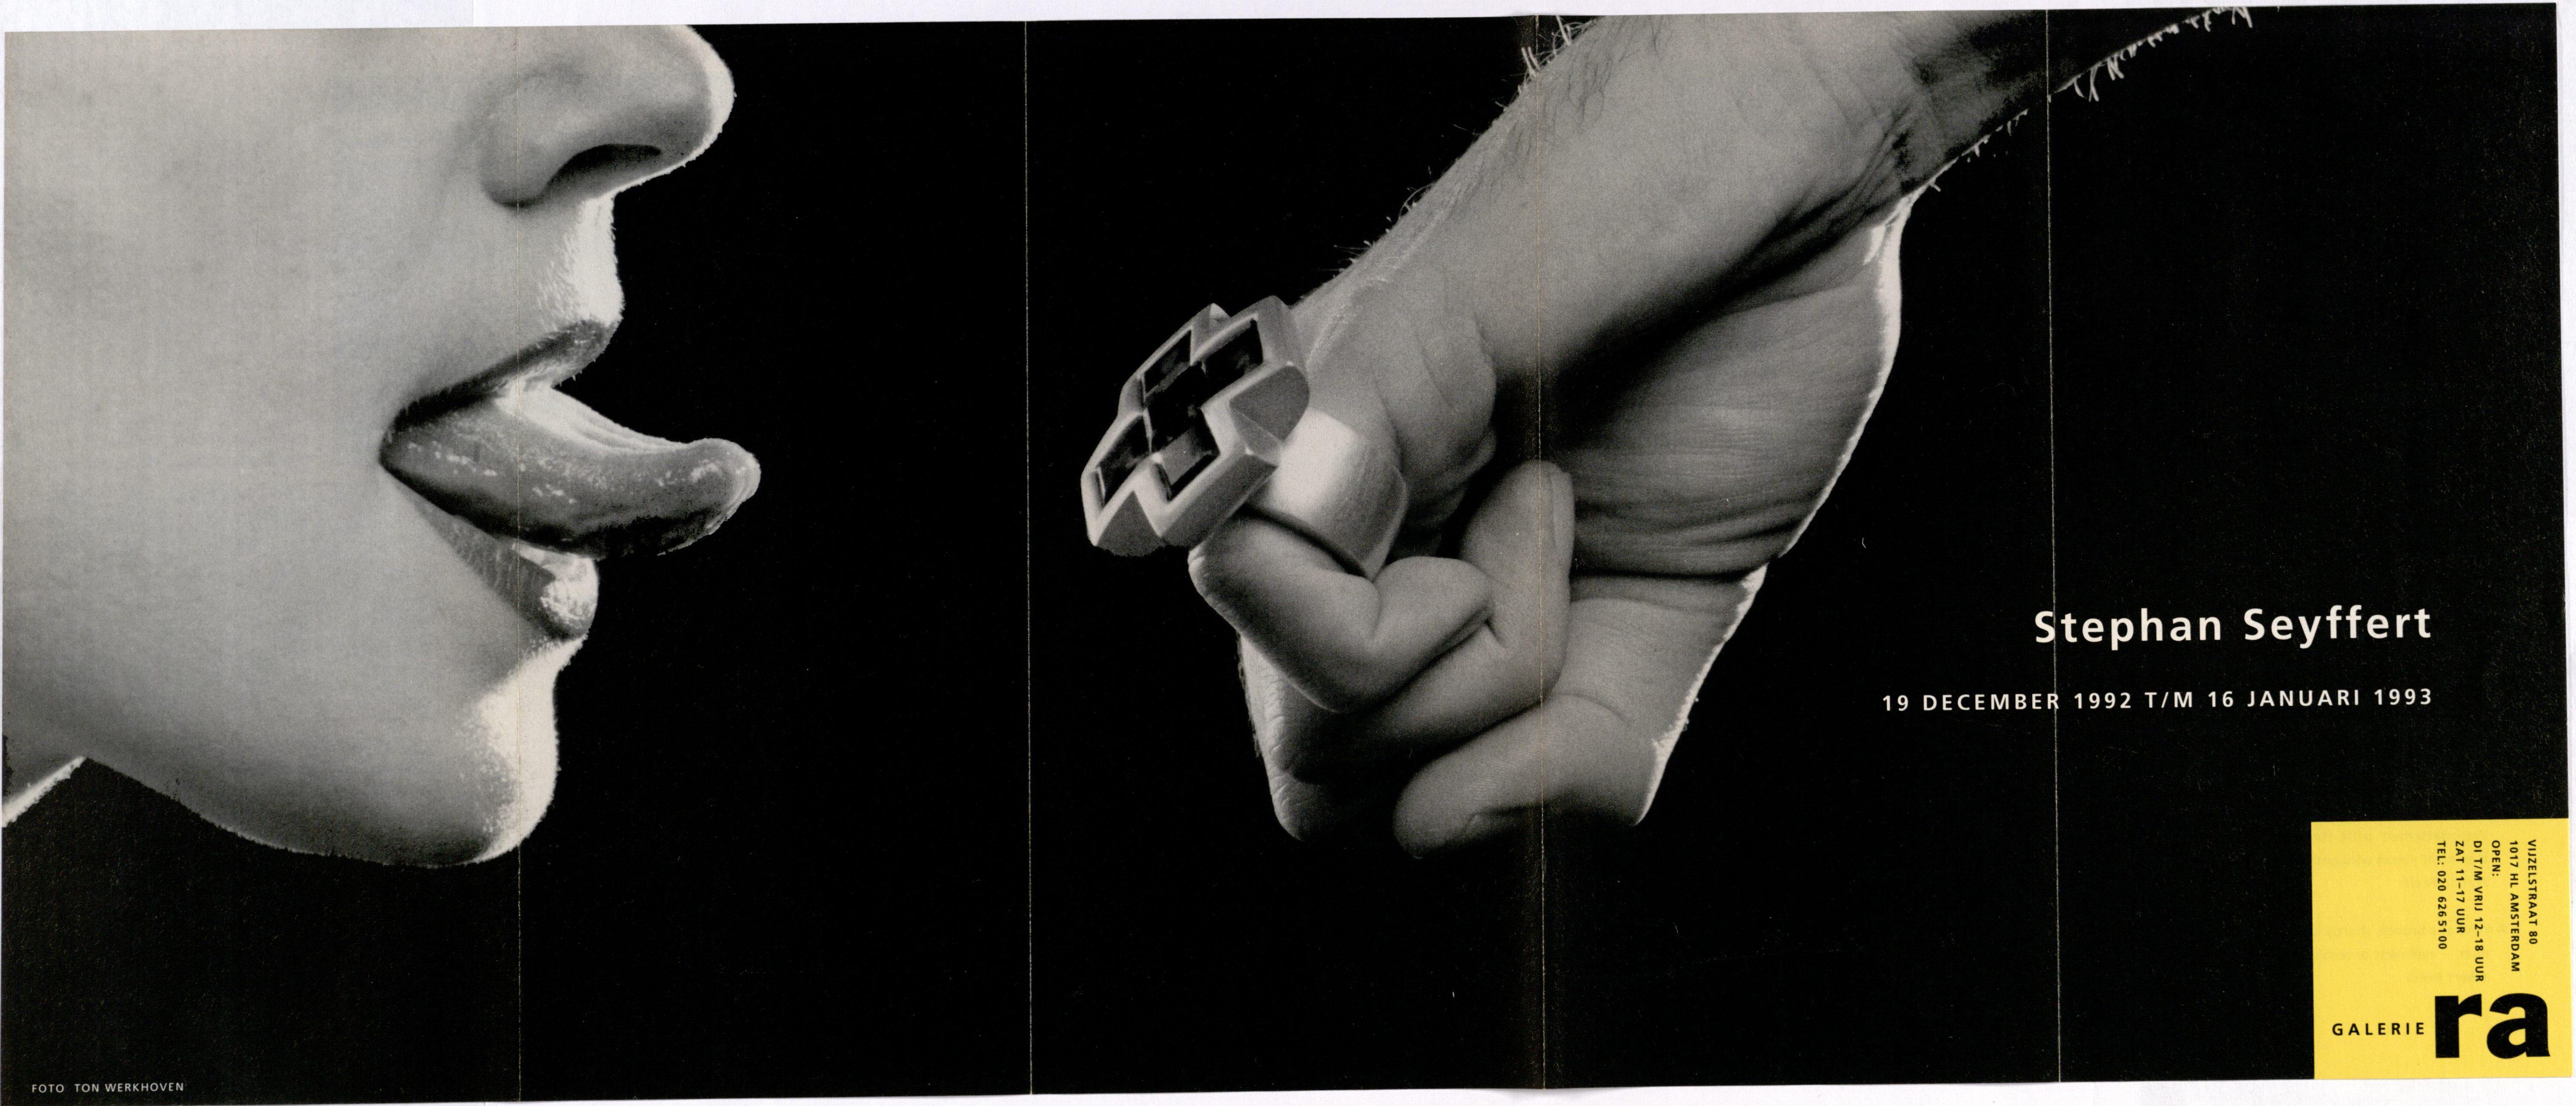 Ra Bulletin 71, december 1992, voorzijde met foto van Ton Werkhoven met ring van Stephan Seyffert, drukwerk, papier, metaal